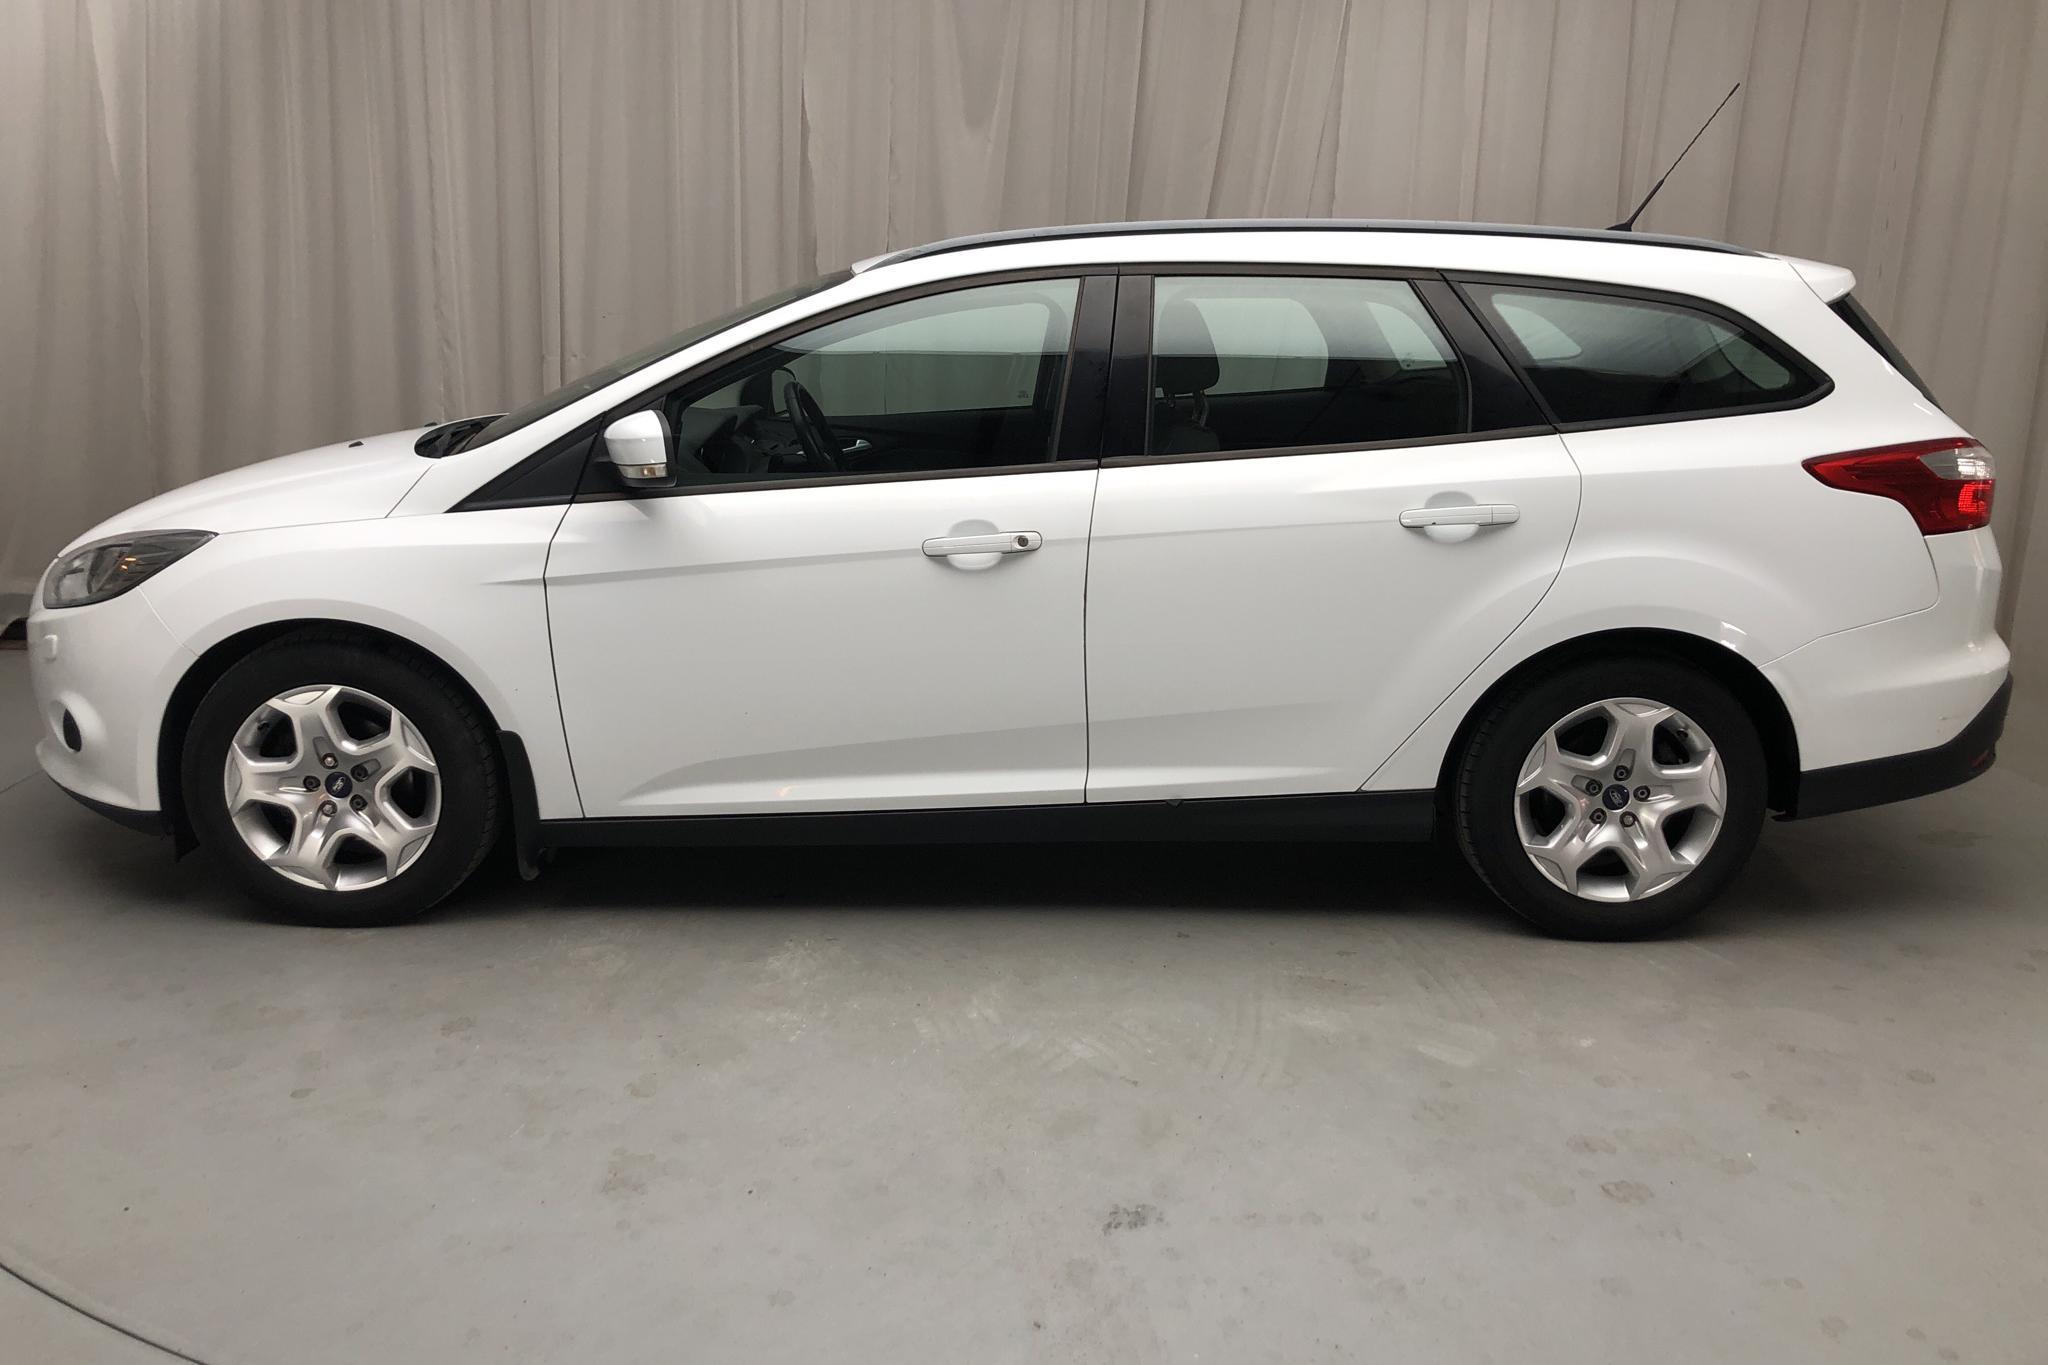 Ford Focus 1.6 TDCi Kombi (95hk) - 79 100 km - Manual - white - 2012